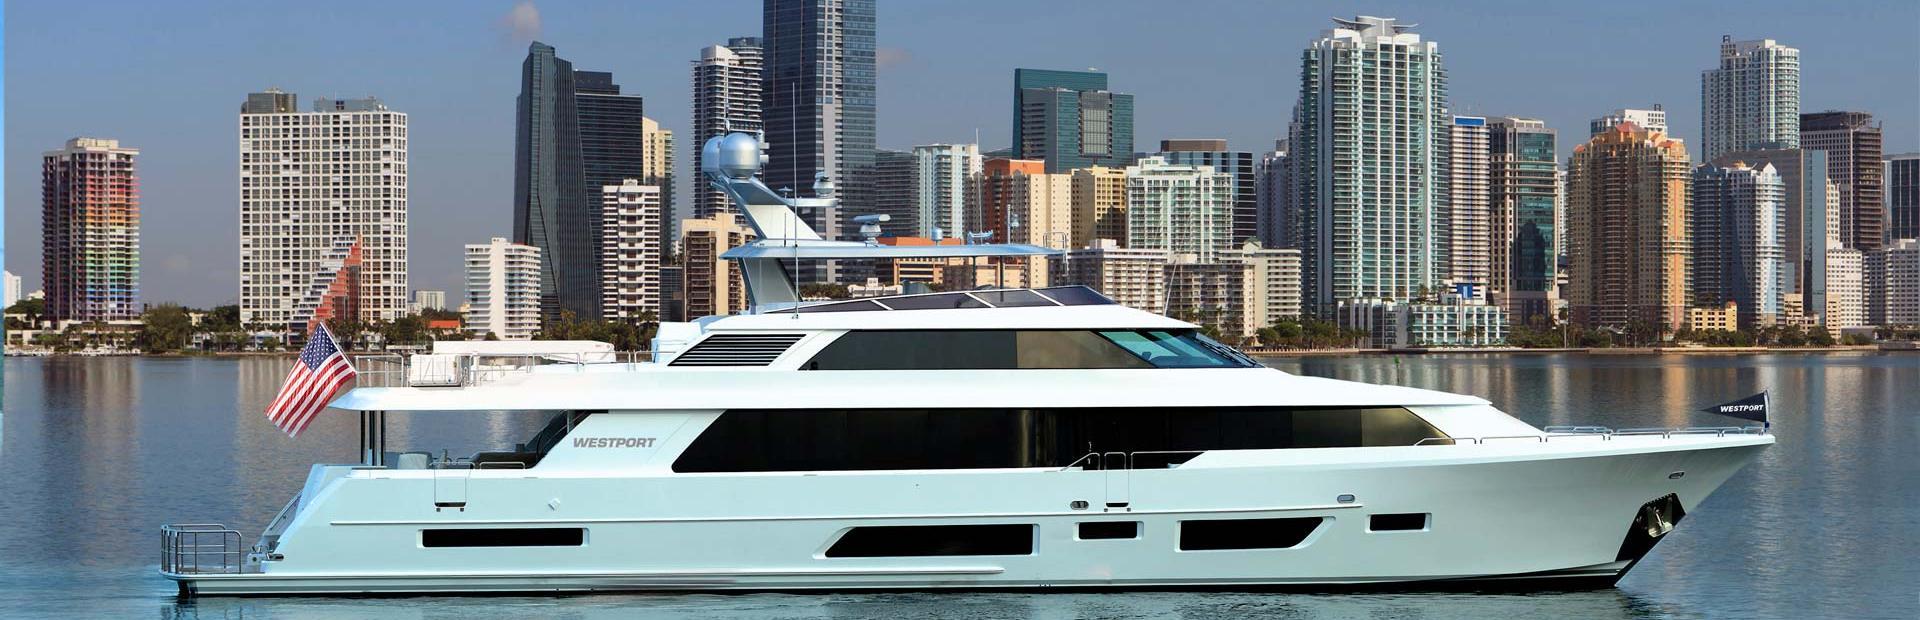 Westport 112 Yacht Charter